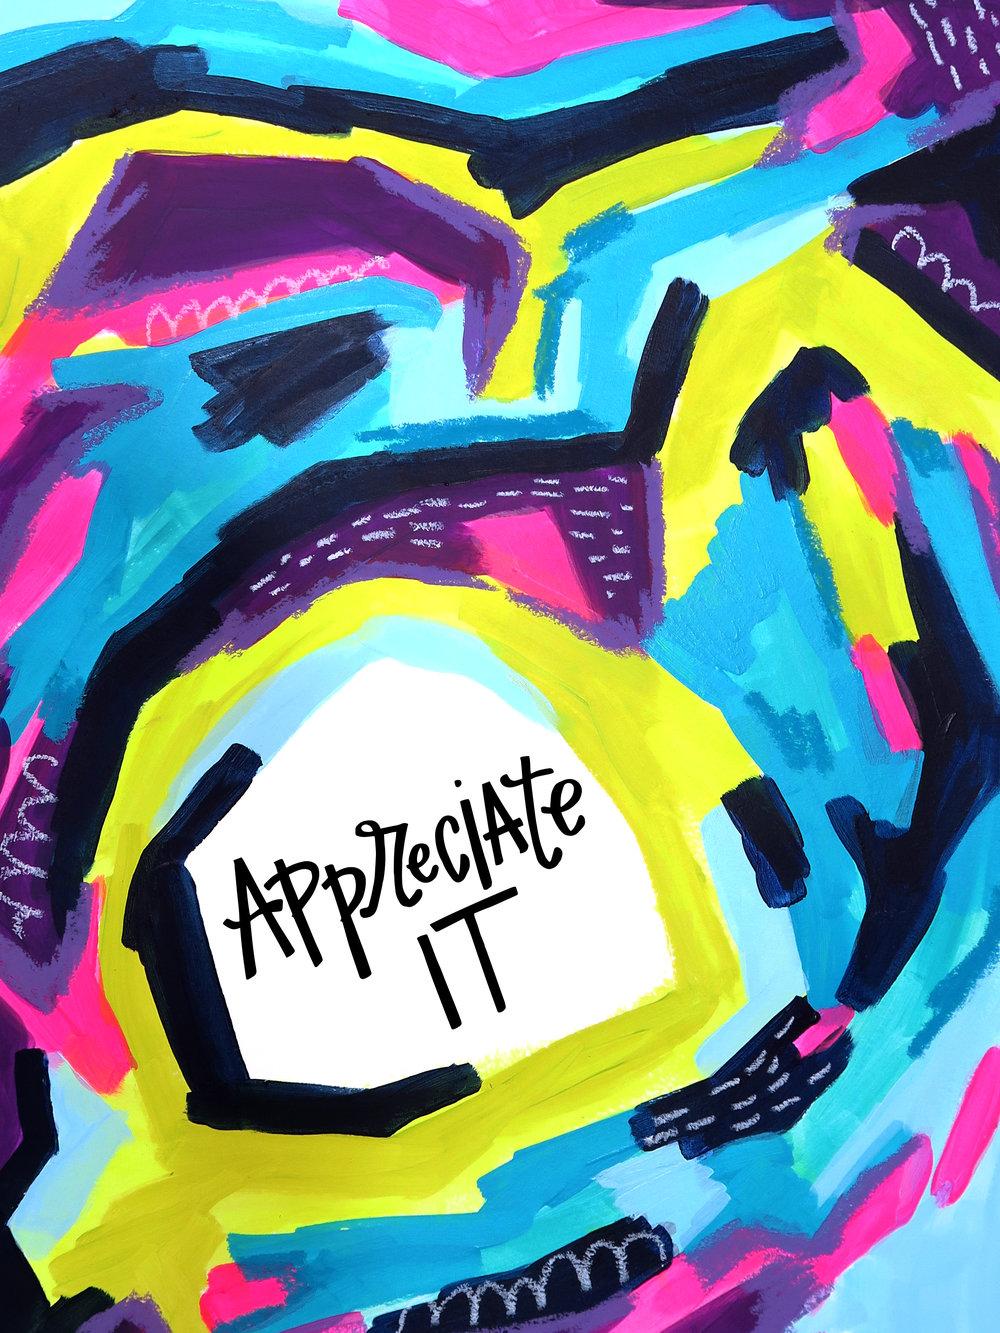 4/23/16: Appreciate